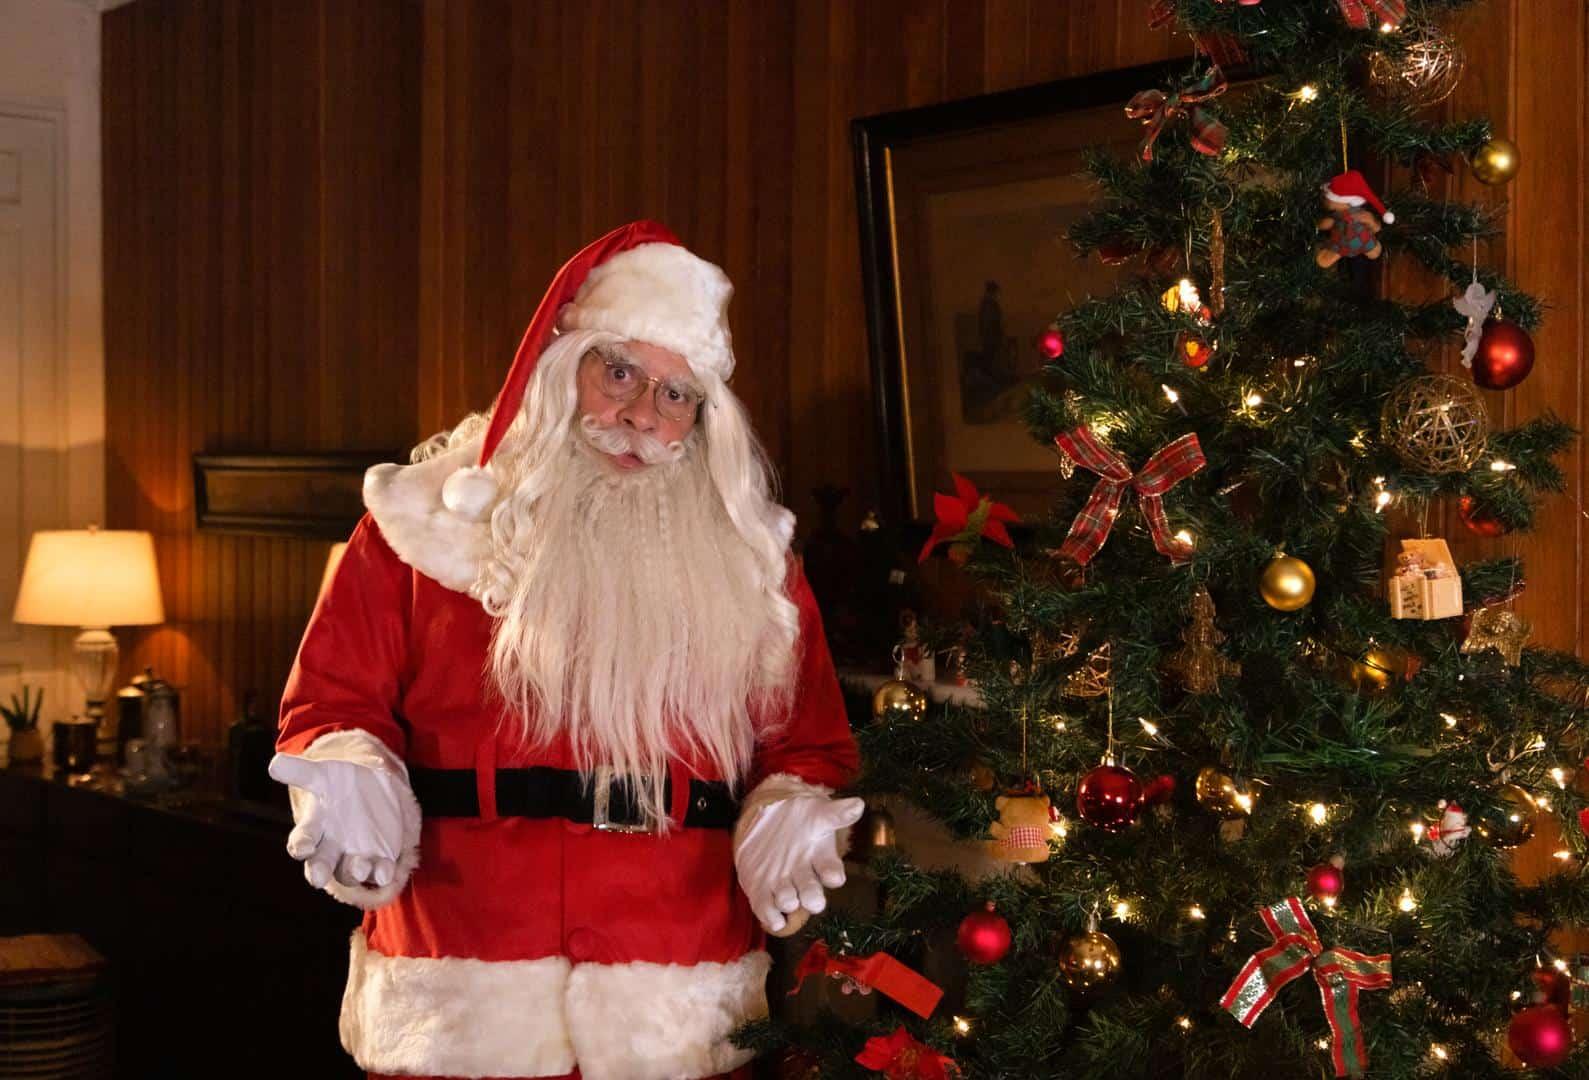 Tudo Bem No Natal Que Vem / Just Another Christmas Available December 3